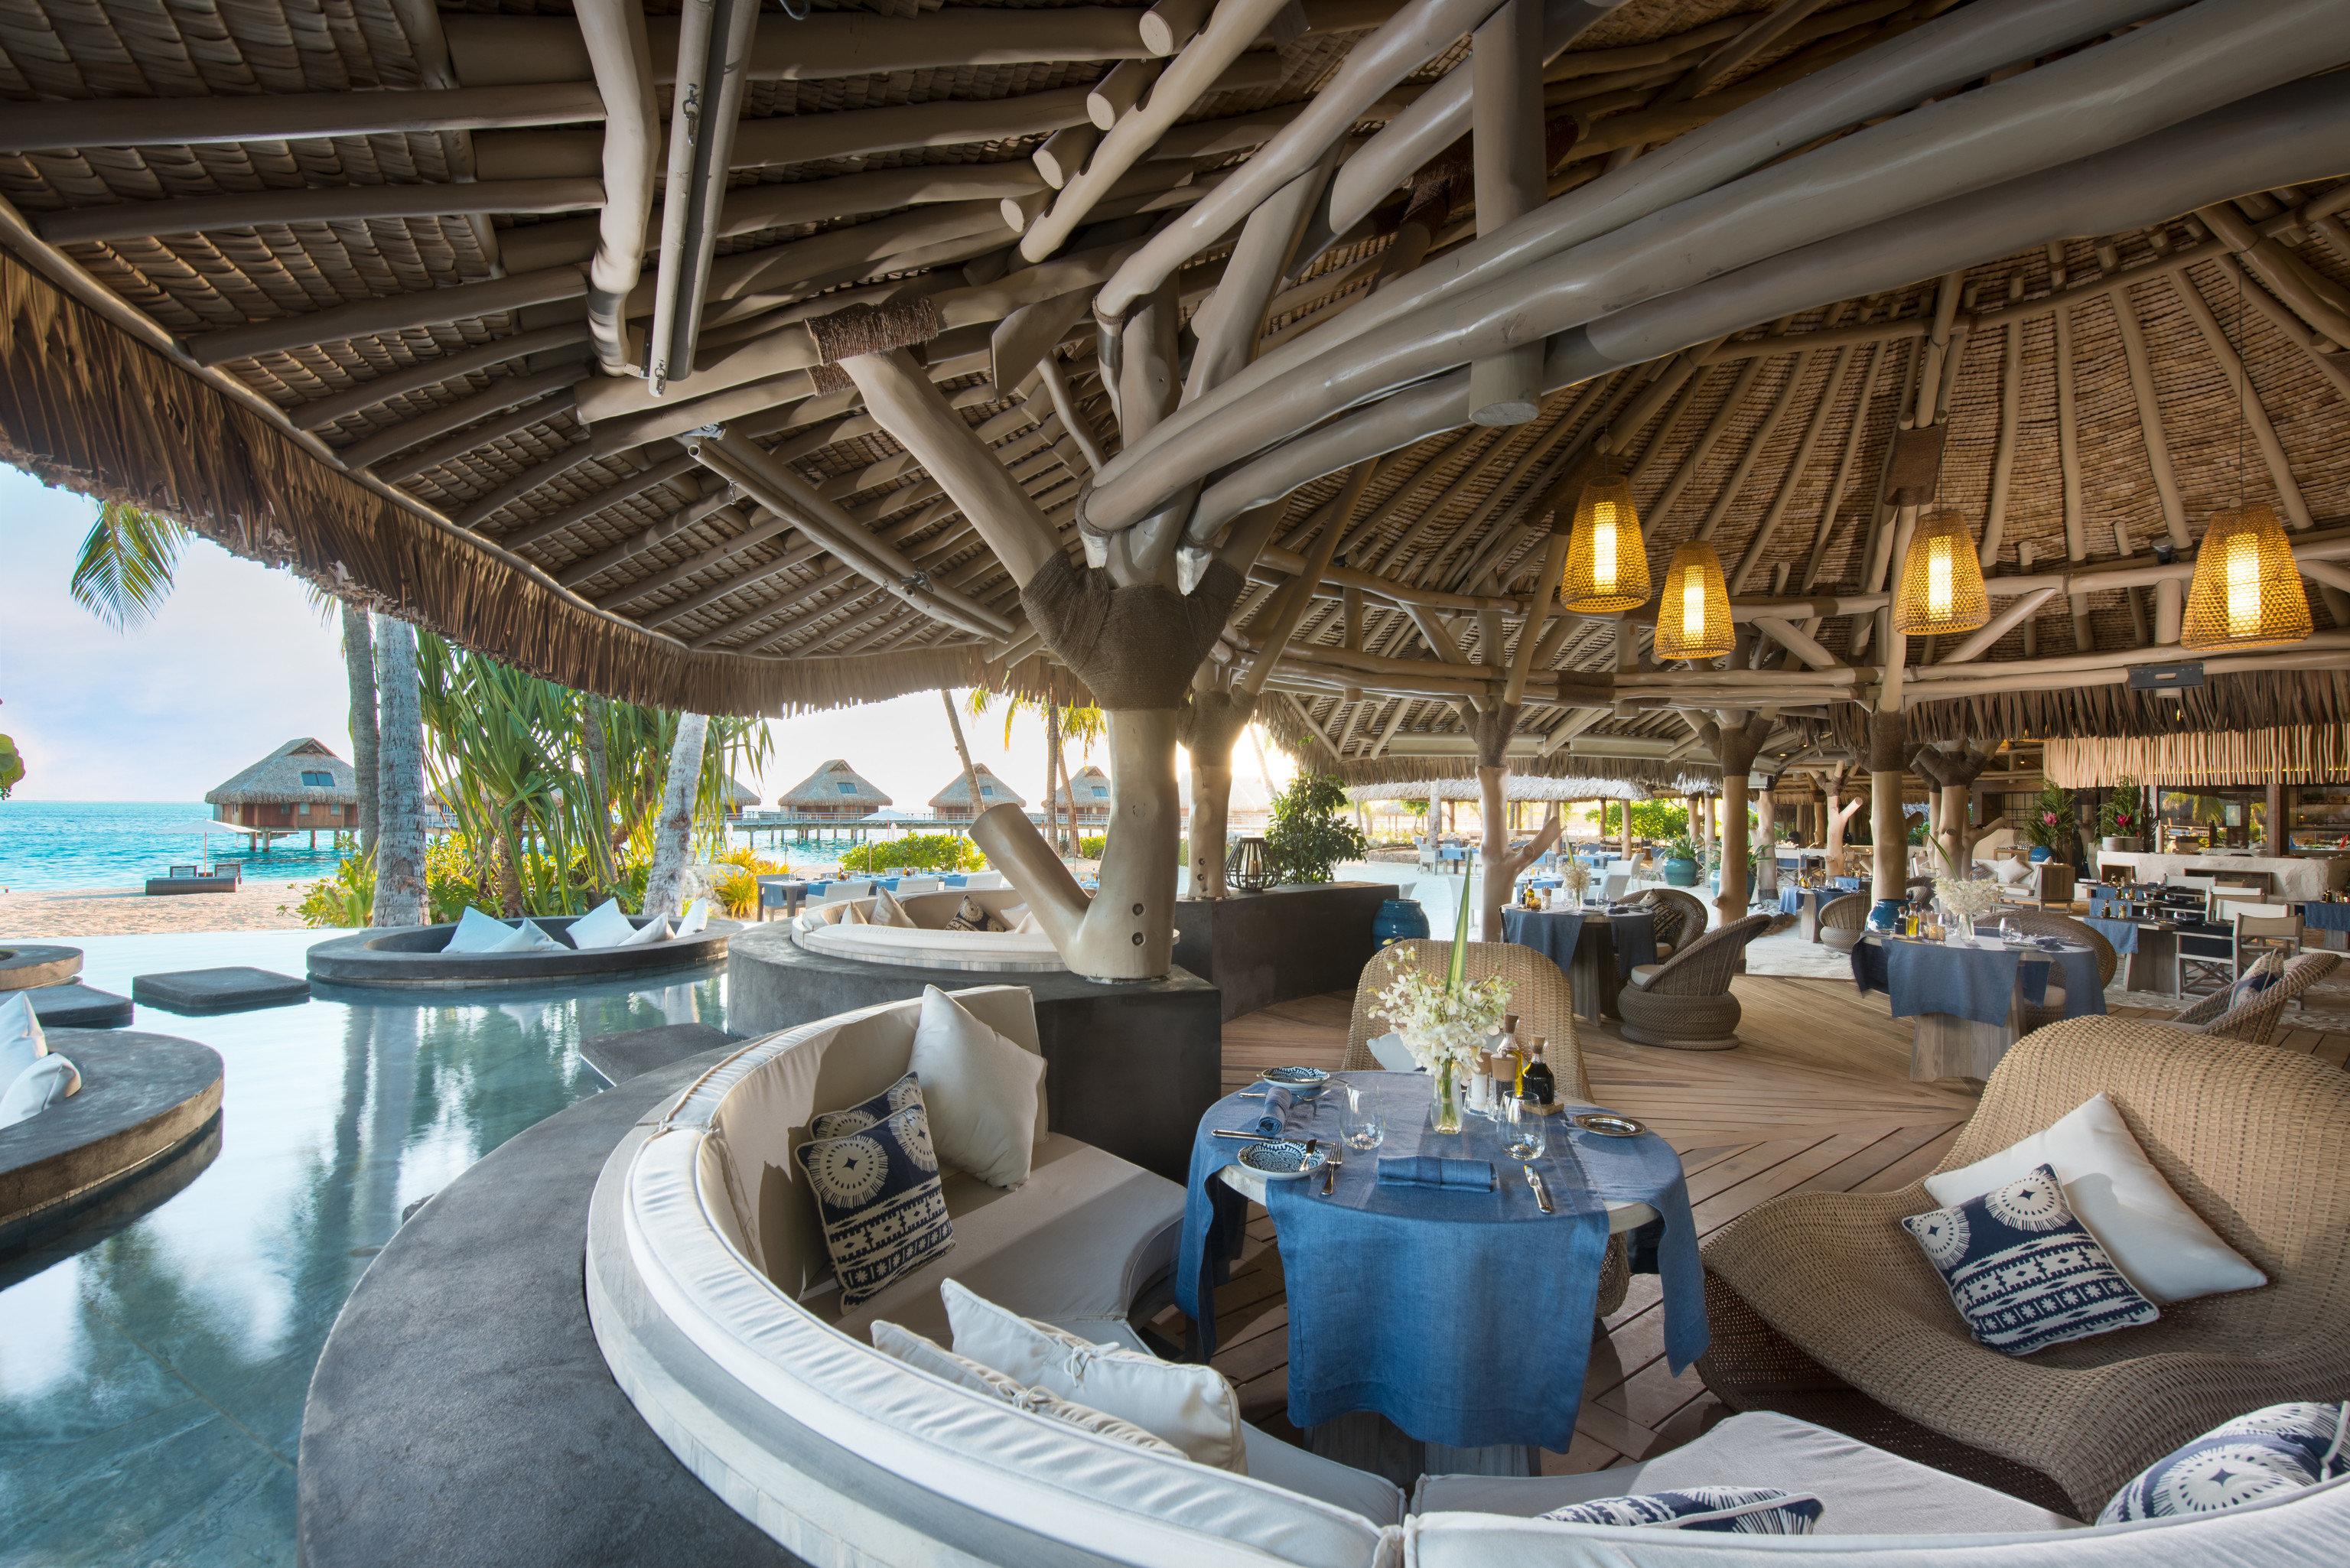 Resort leisure swimming pool resort town